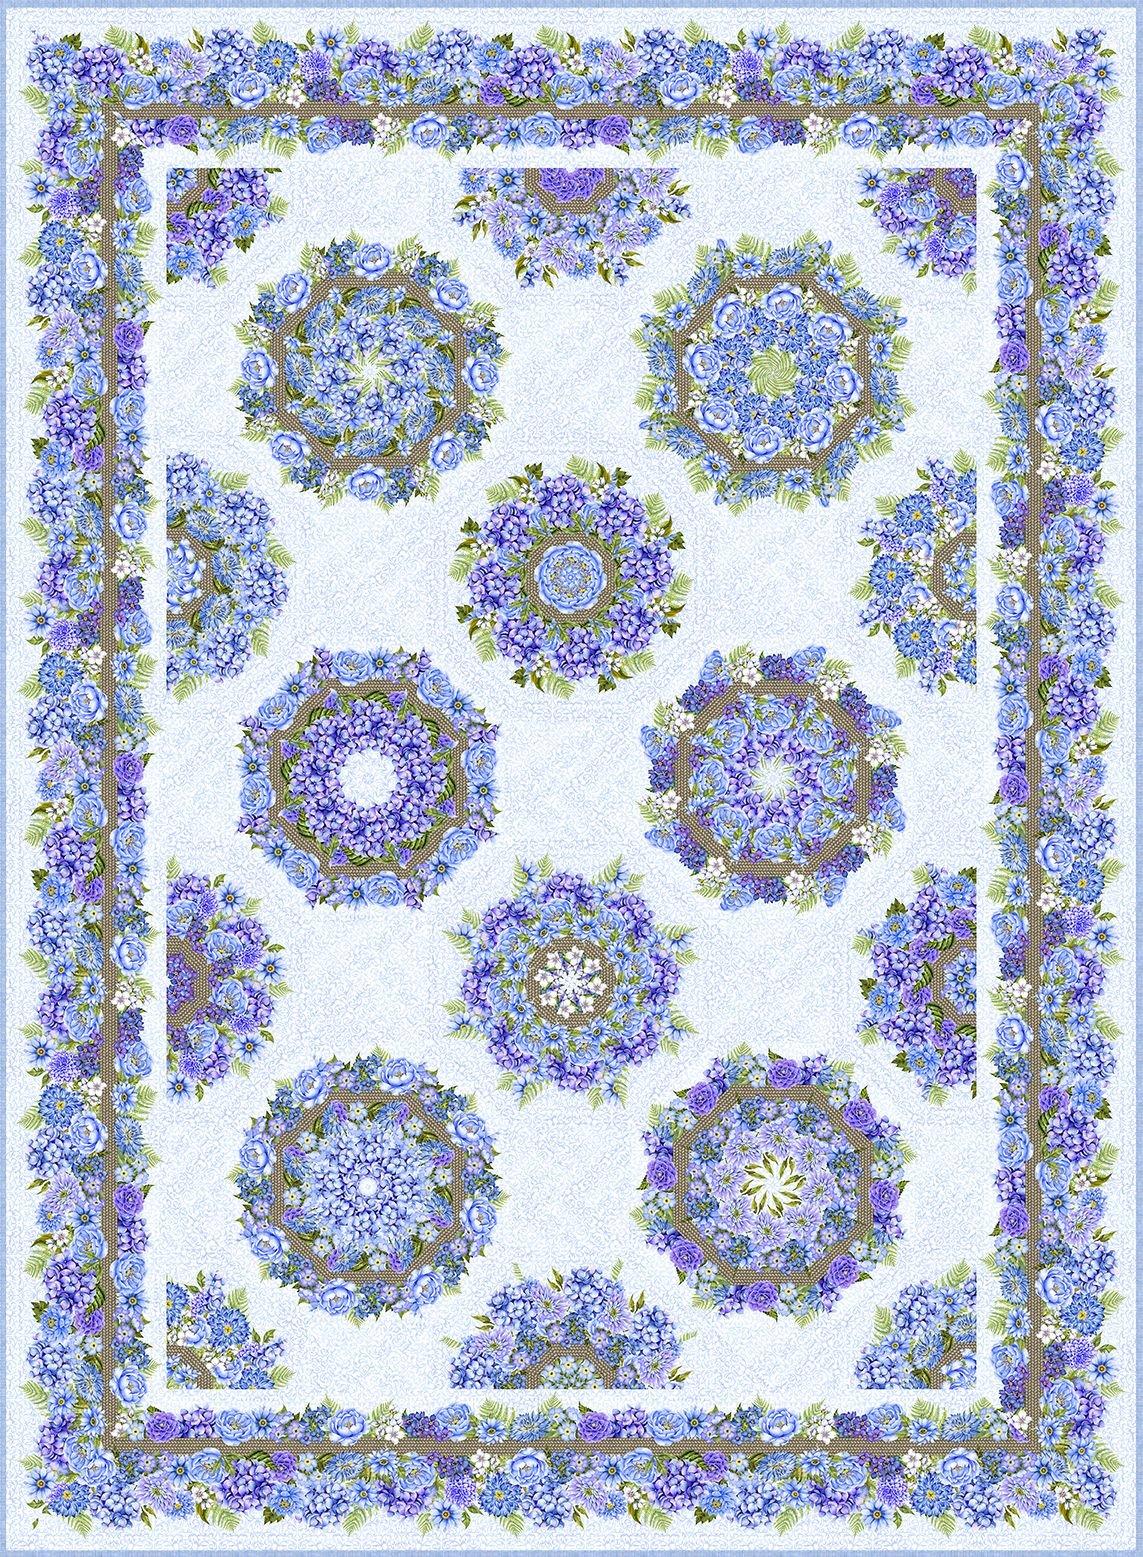 Karen's Garden Kaleidoscope Pattern